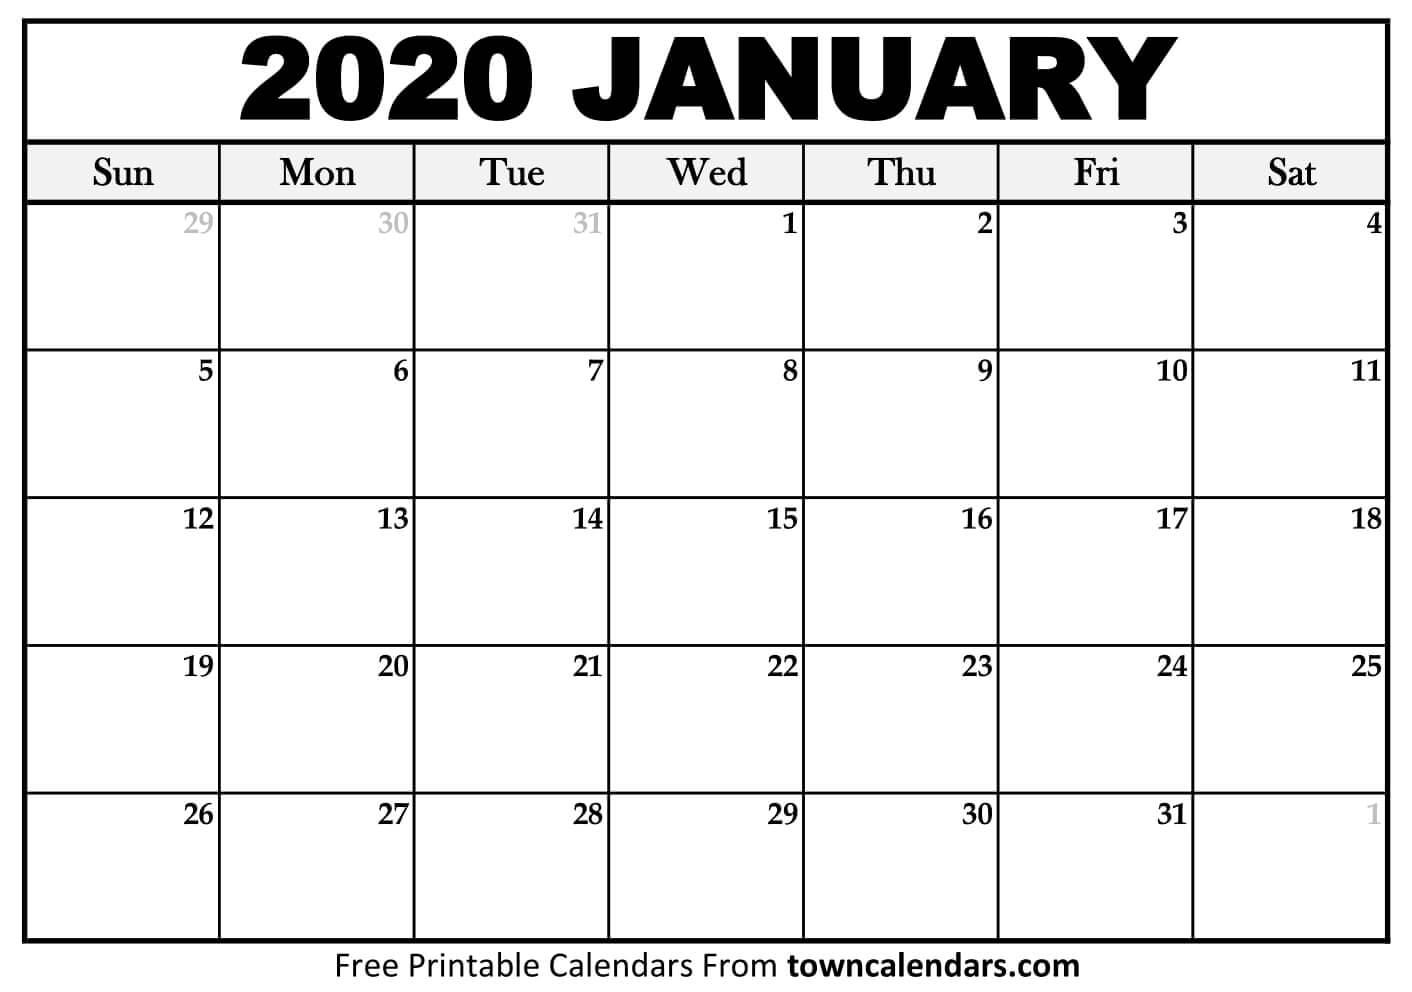 2020 Calendar Printable - Towncalendars